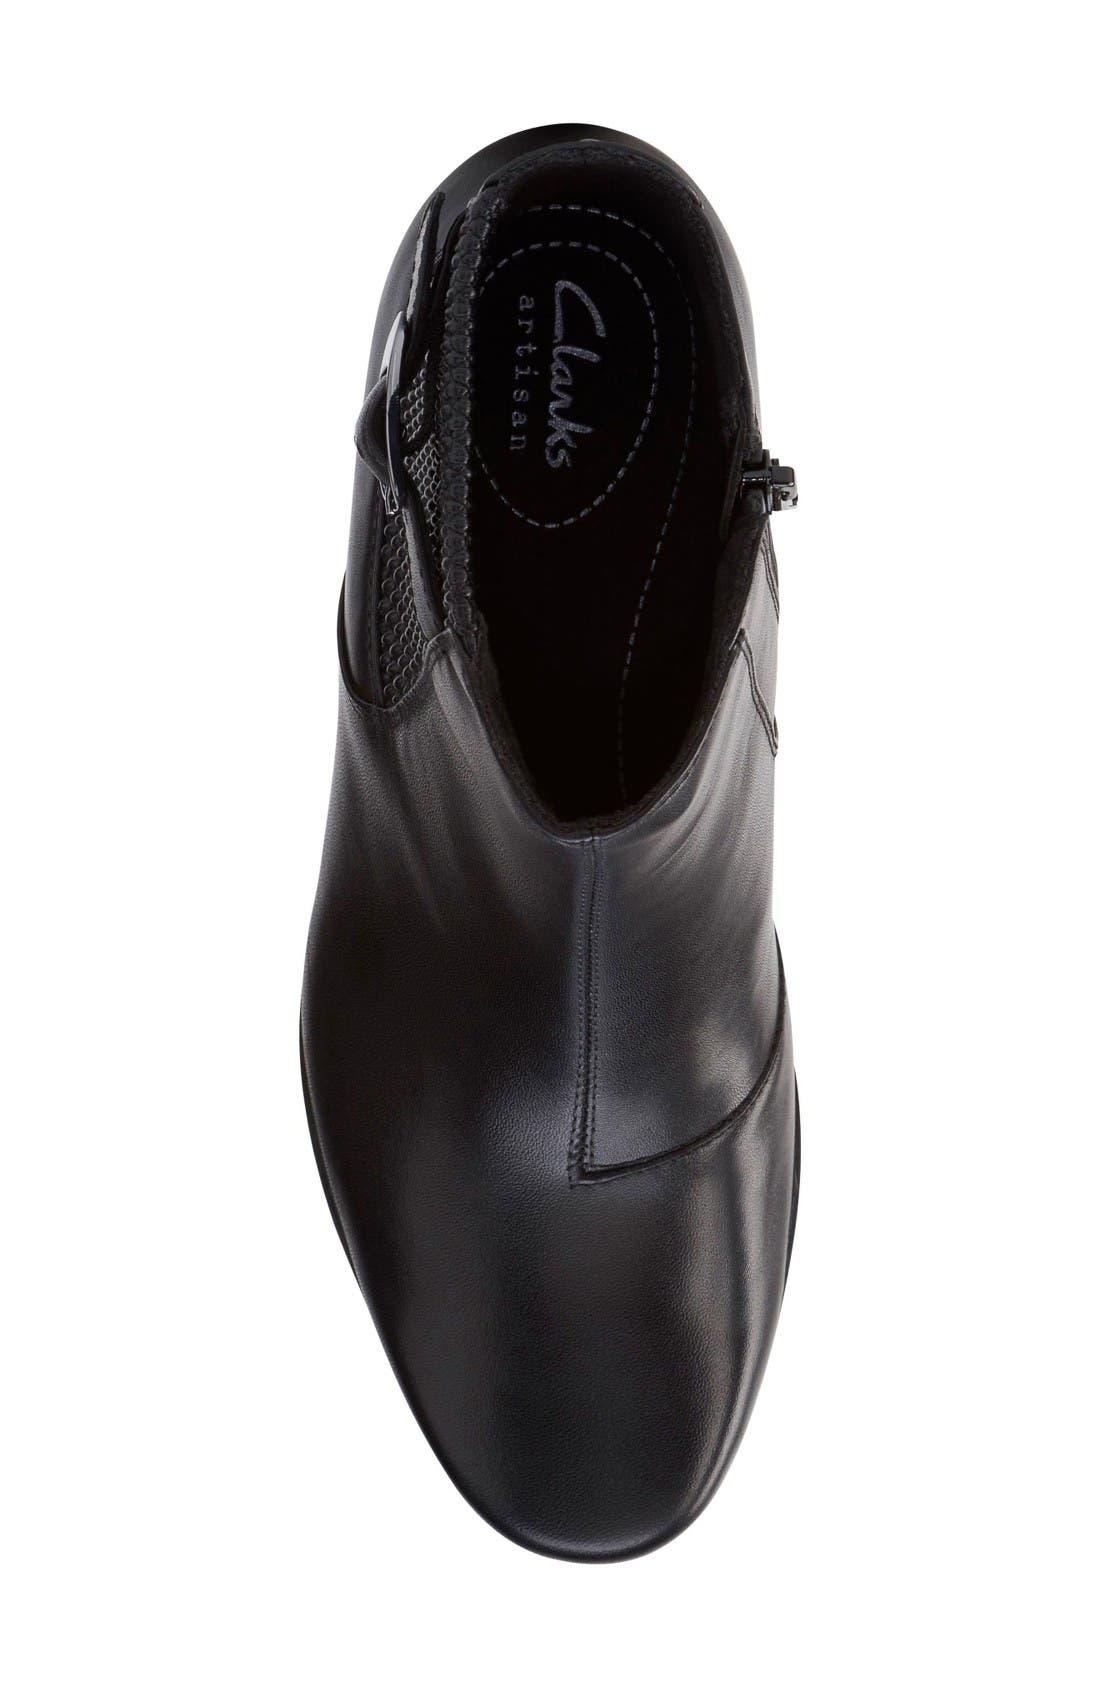 Rosalyn Lara Waterproof Boot,                             Alternate thumbnail 4, color,                             Black Leather